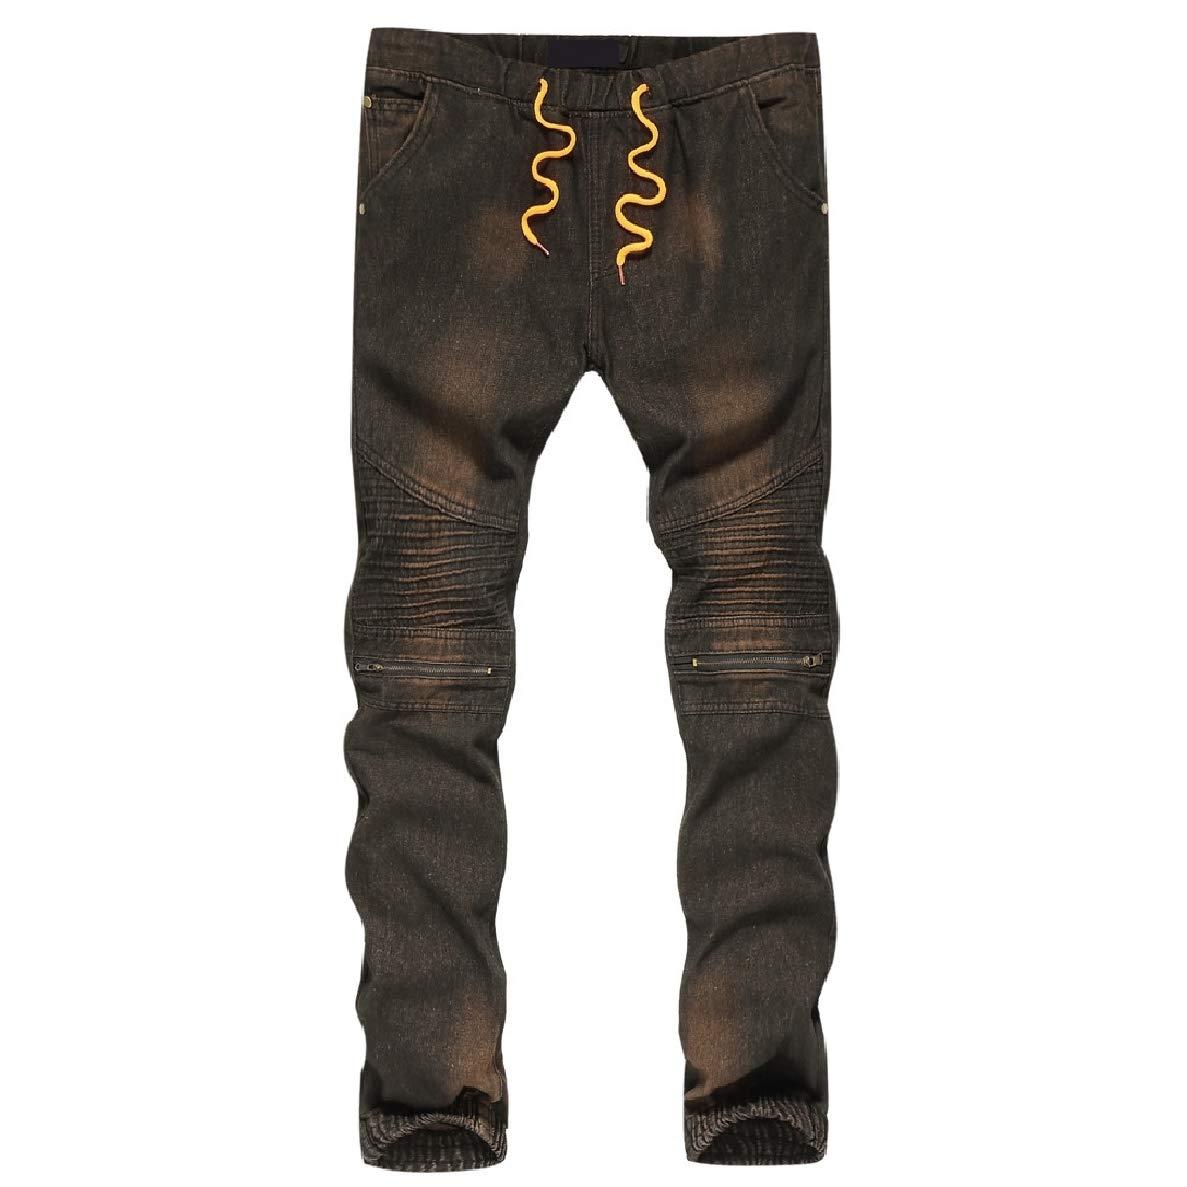 Winwinus Men Fashion Faded Beam Foot Ruffle Casual Zipper Standard-fit Jeans